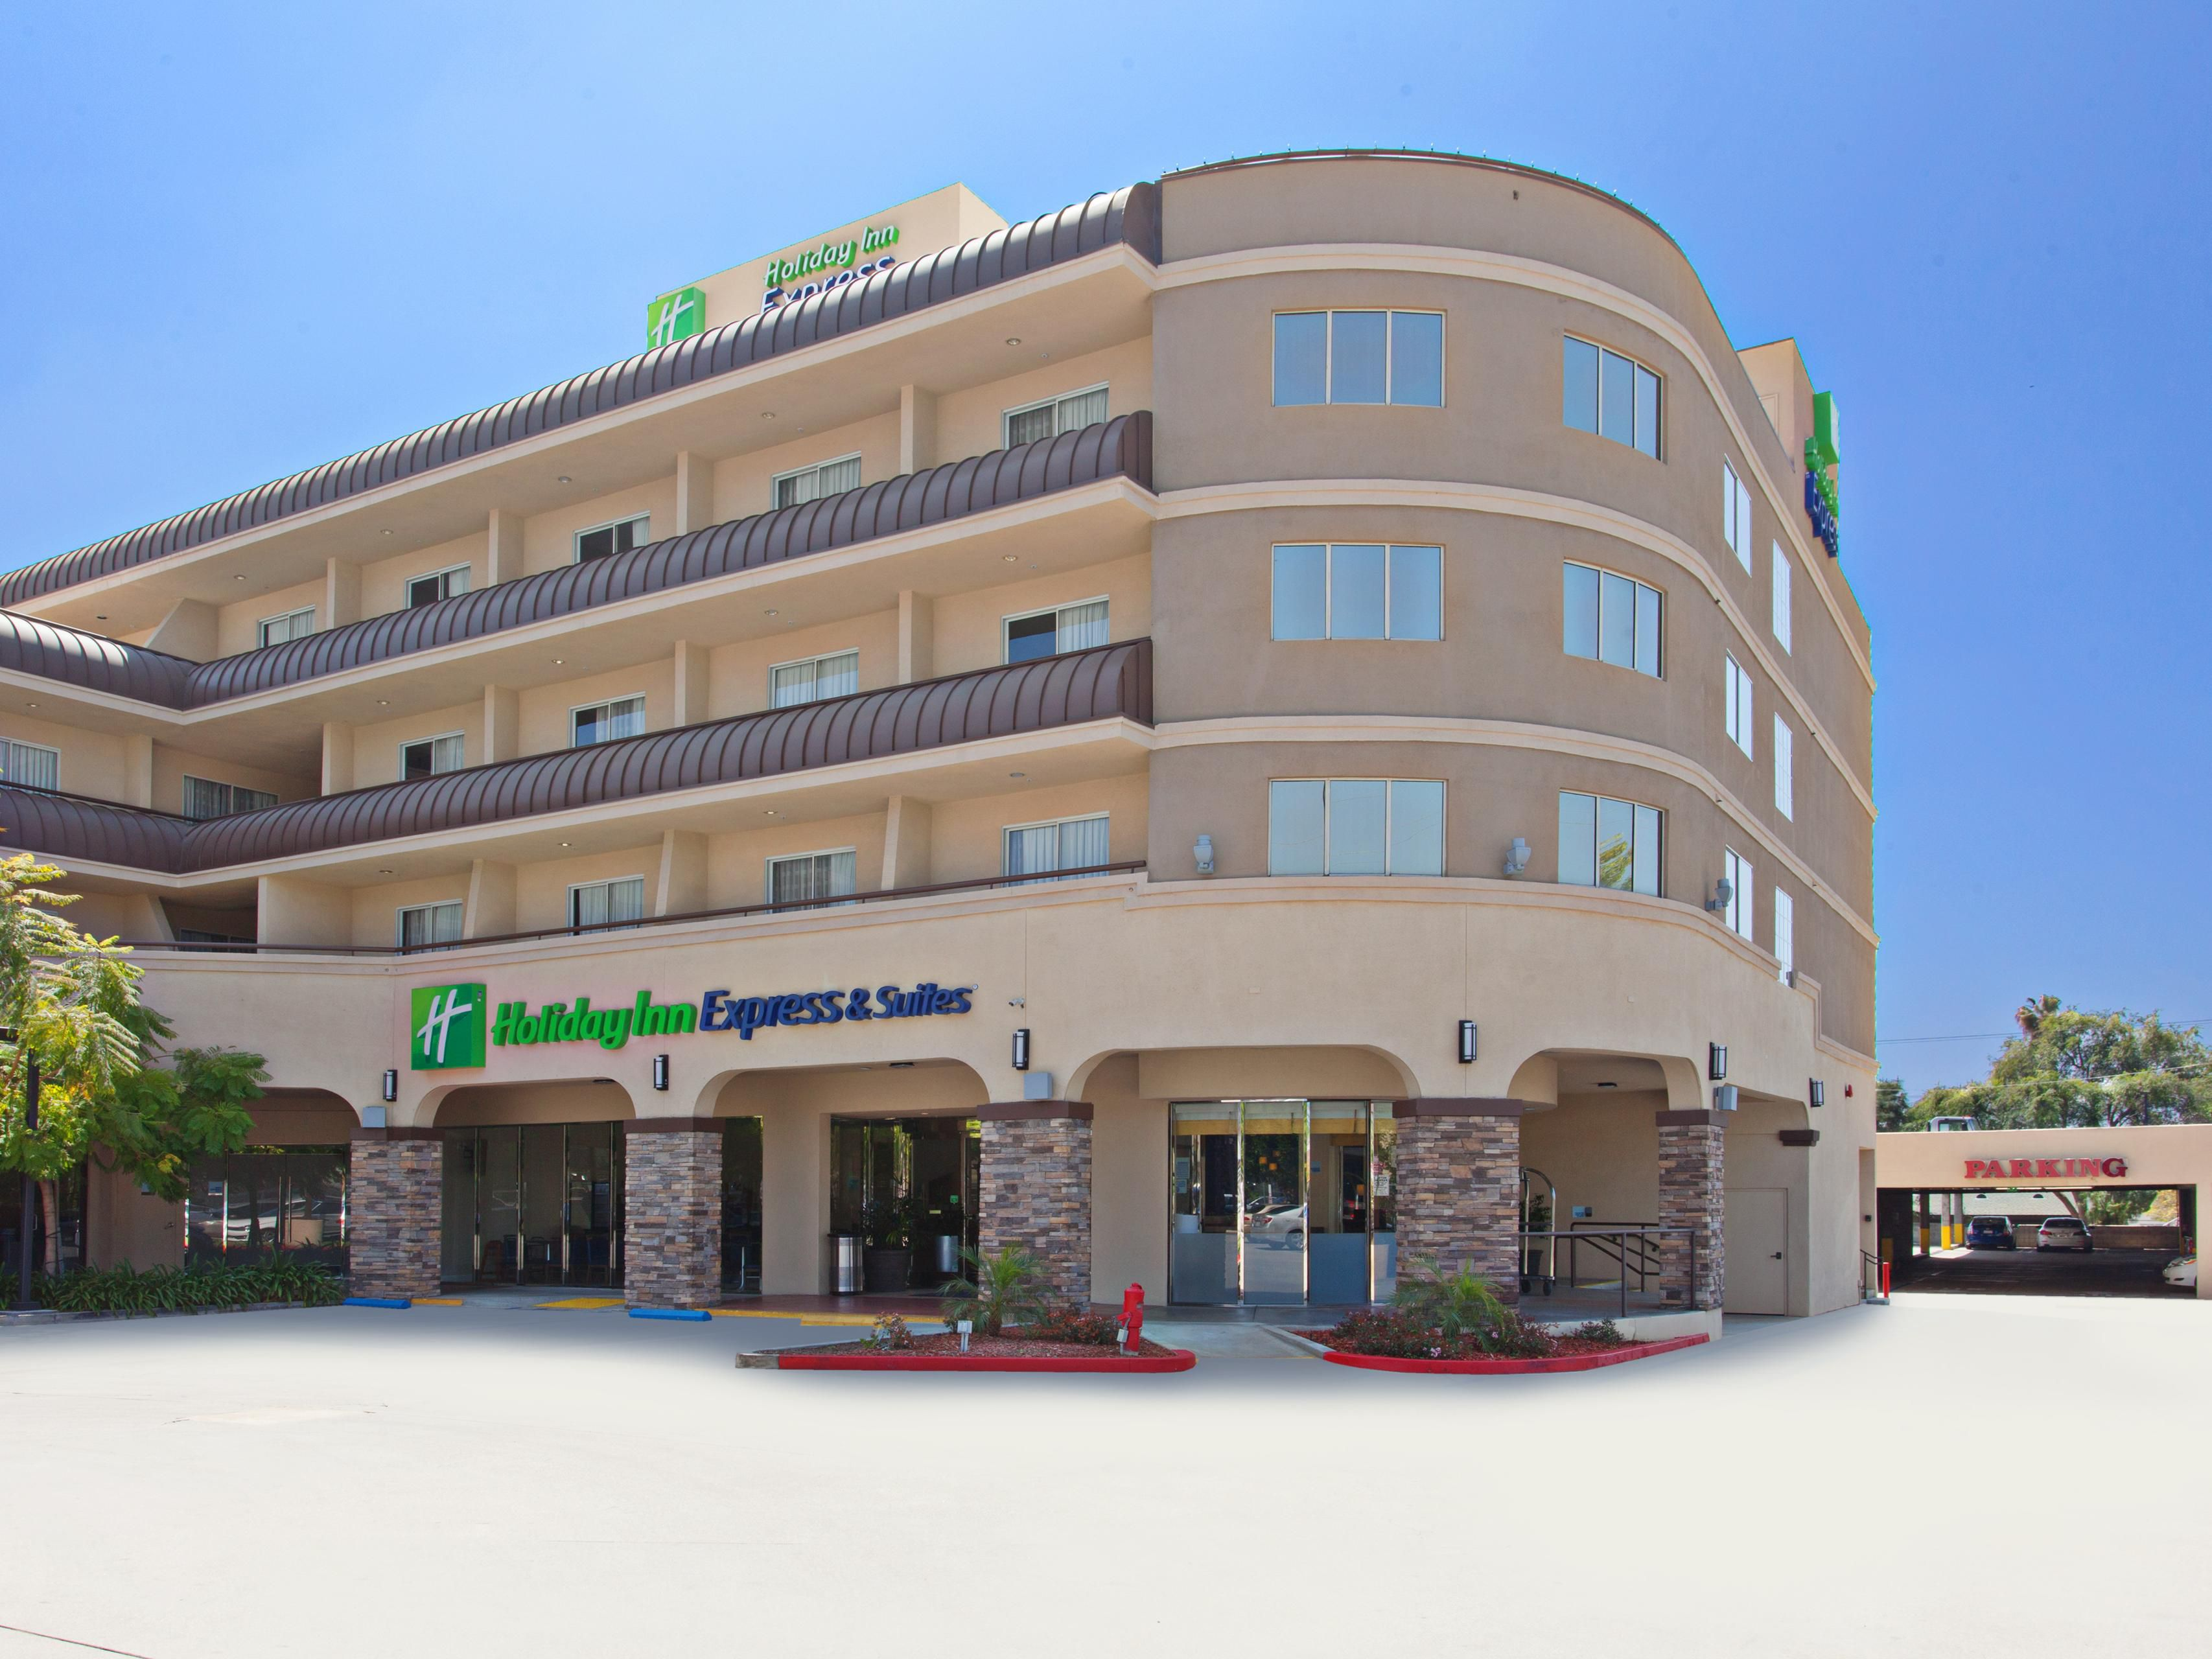 Holiday Inn Express Suites Pasadena Colorado Blvd